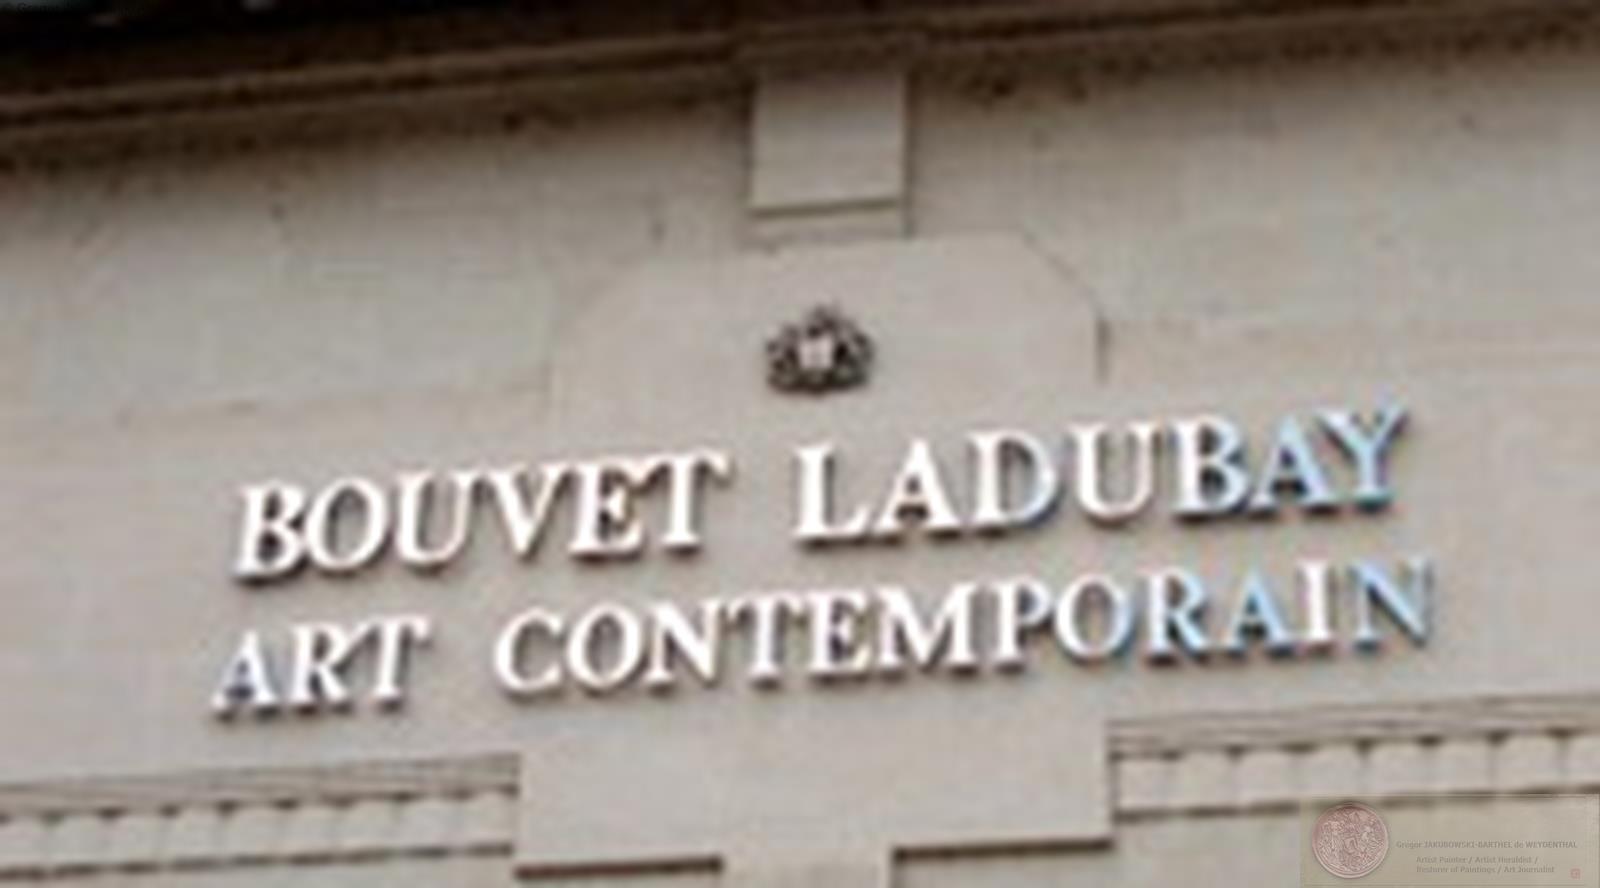 Bouvet-Ladubay.CentreArtContemporain